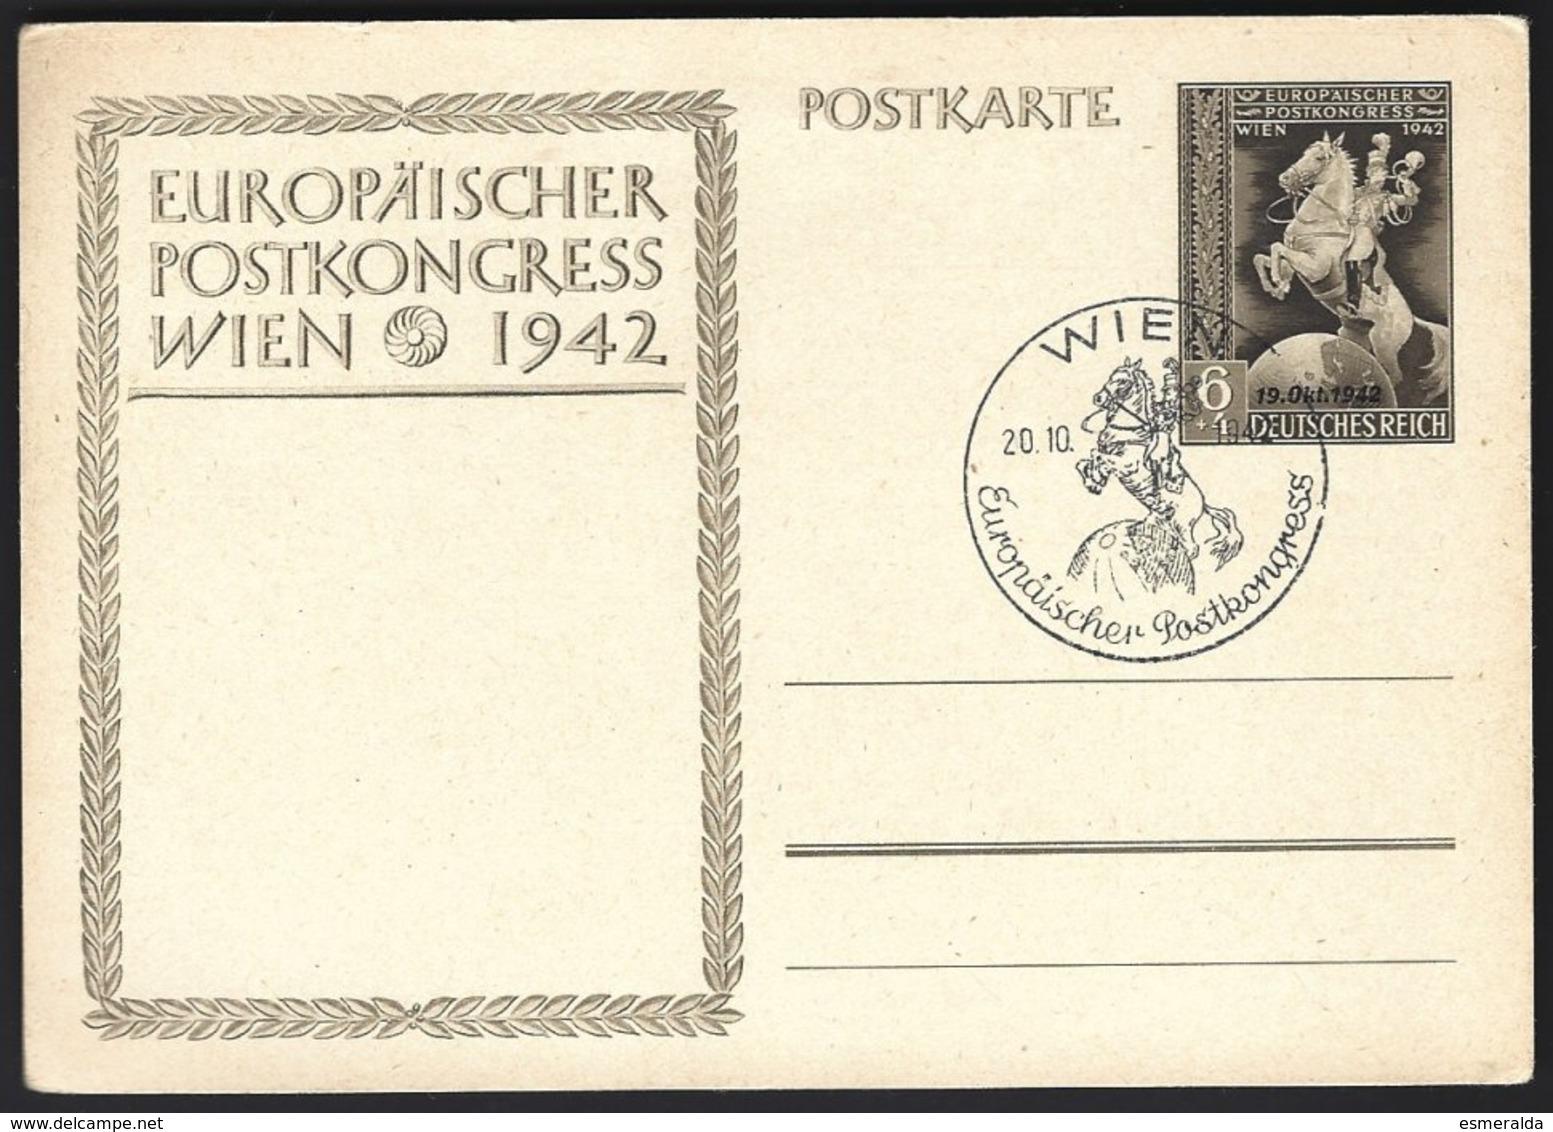 Autriche,stationary-Postkarte : Europäischer Postkongress Wien 1942 - Entiers Postaux